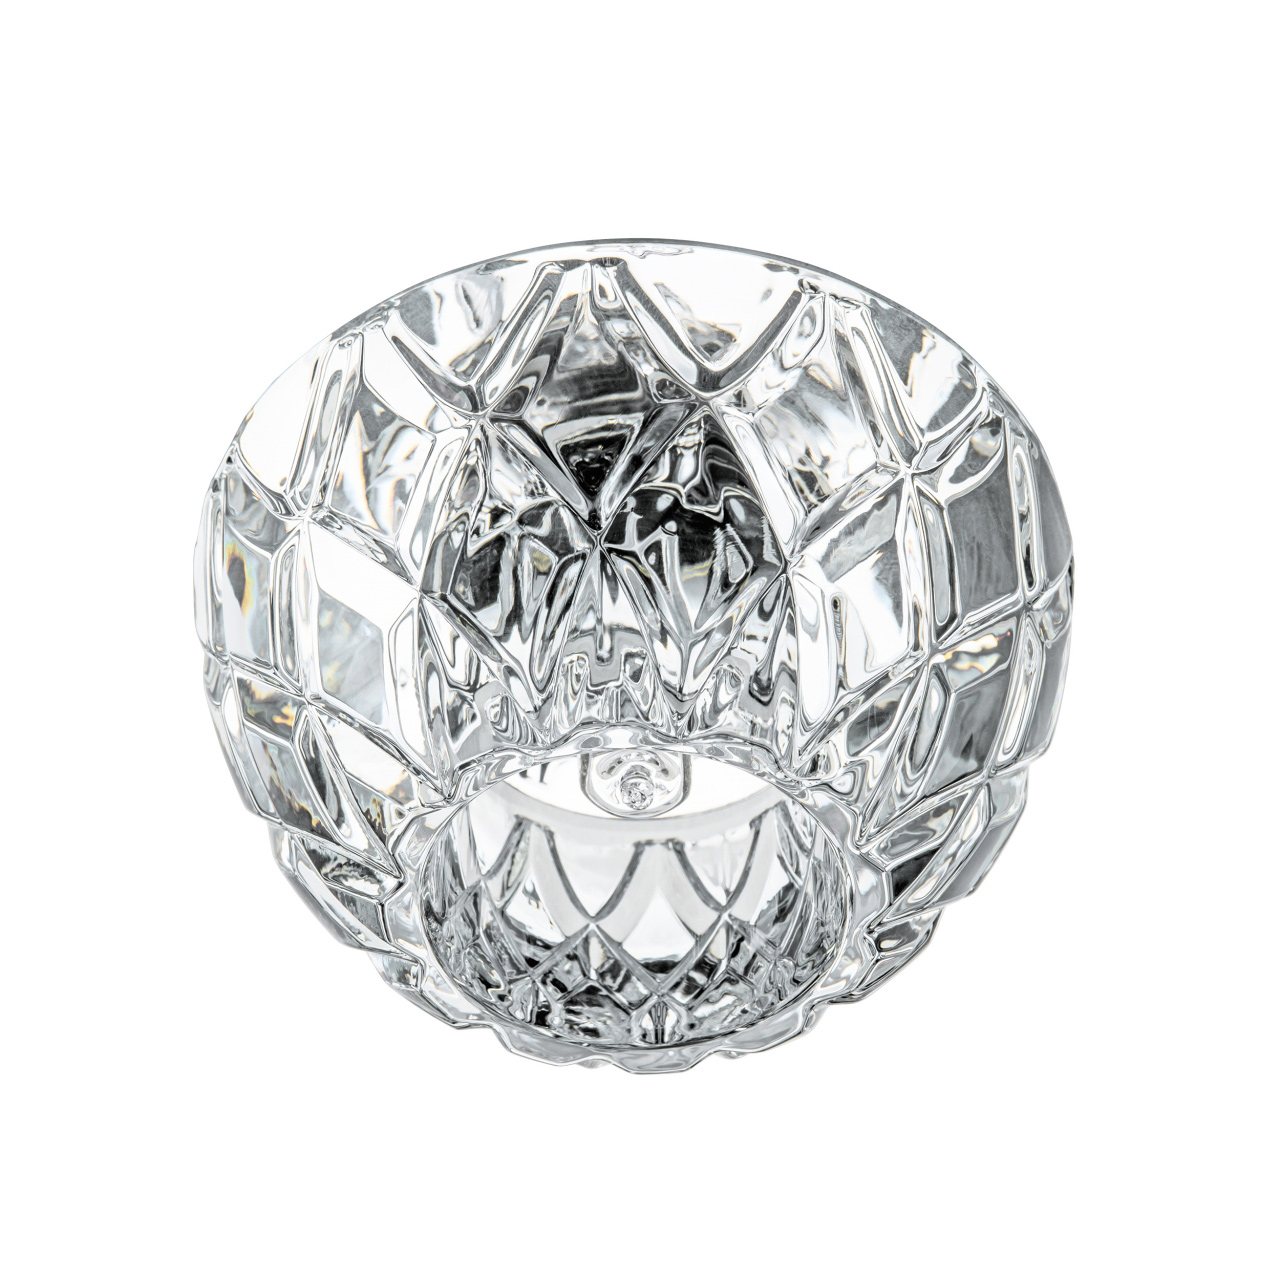 Светильник Faseta G9 хром / прозрачный Lightstar 004334